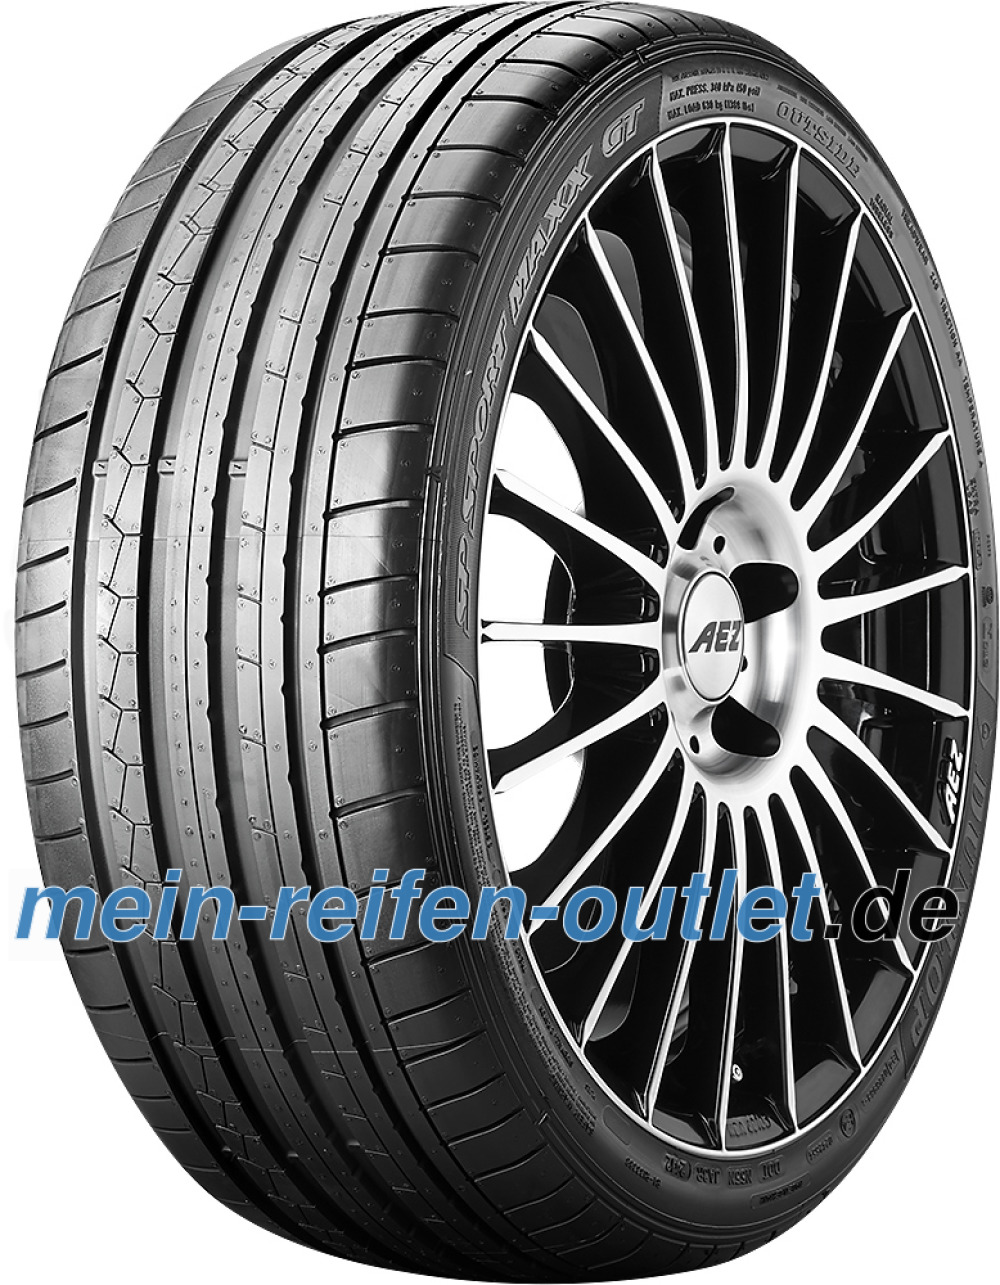 Dunlop SP Sport Maxx GT ( 275/45 ZR18 (107Y) XL J, mit Felgenschutz (MFS) )